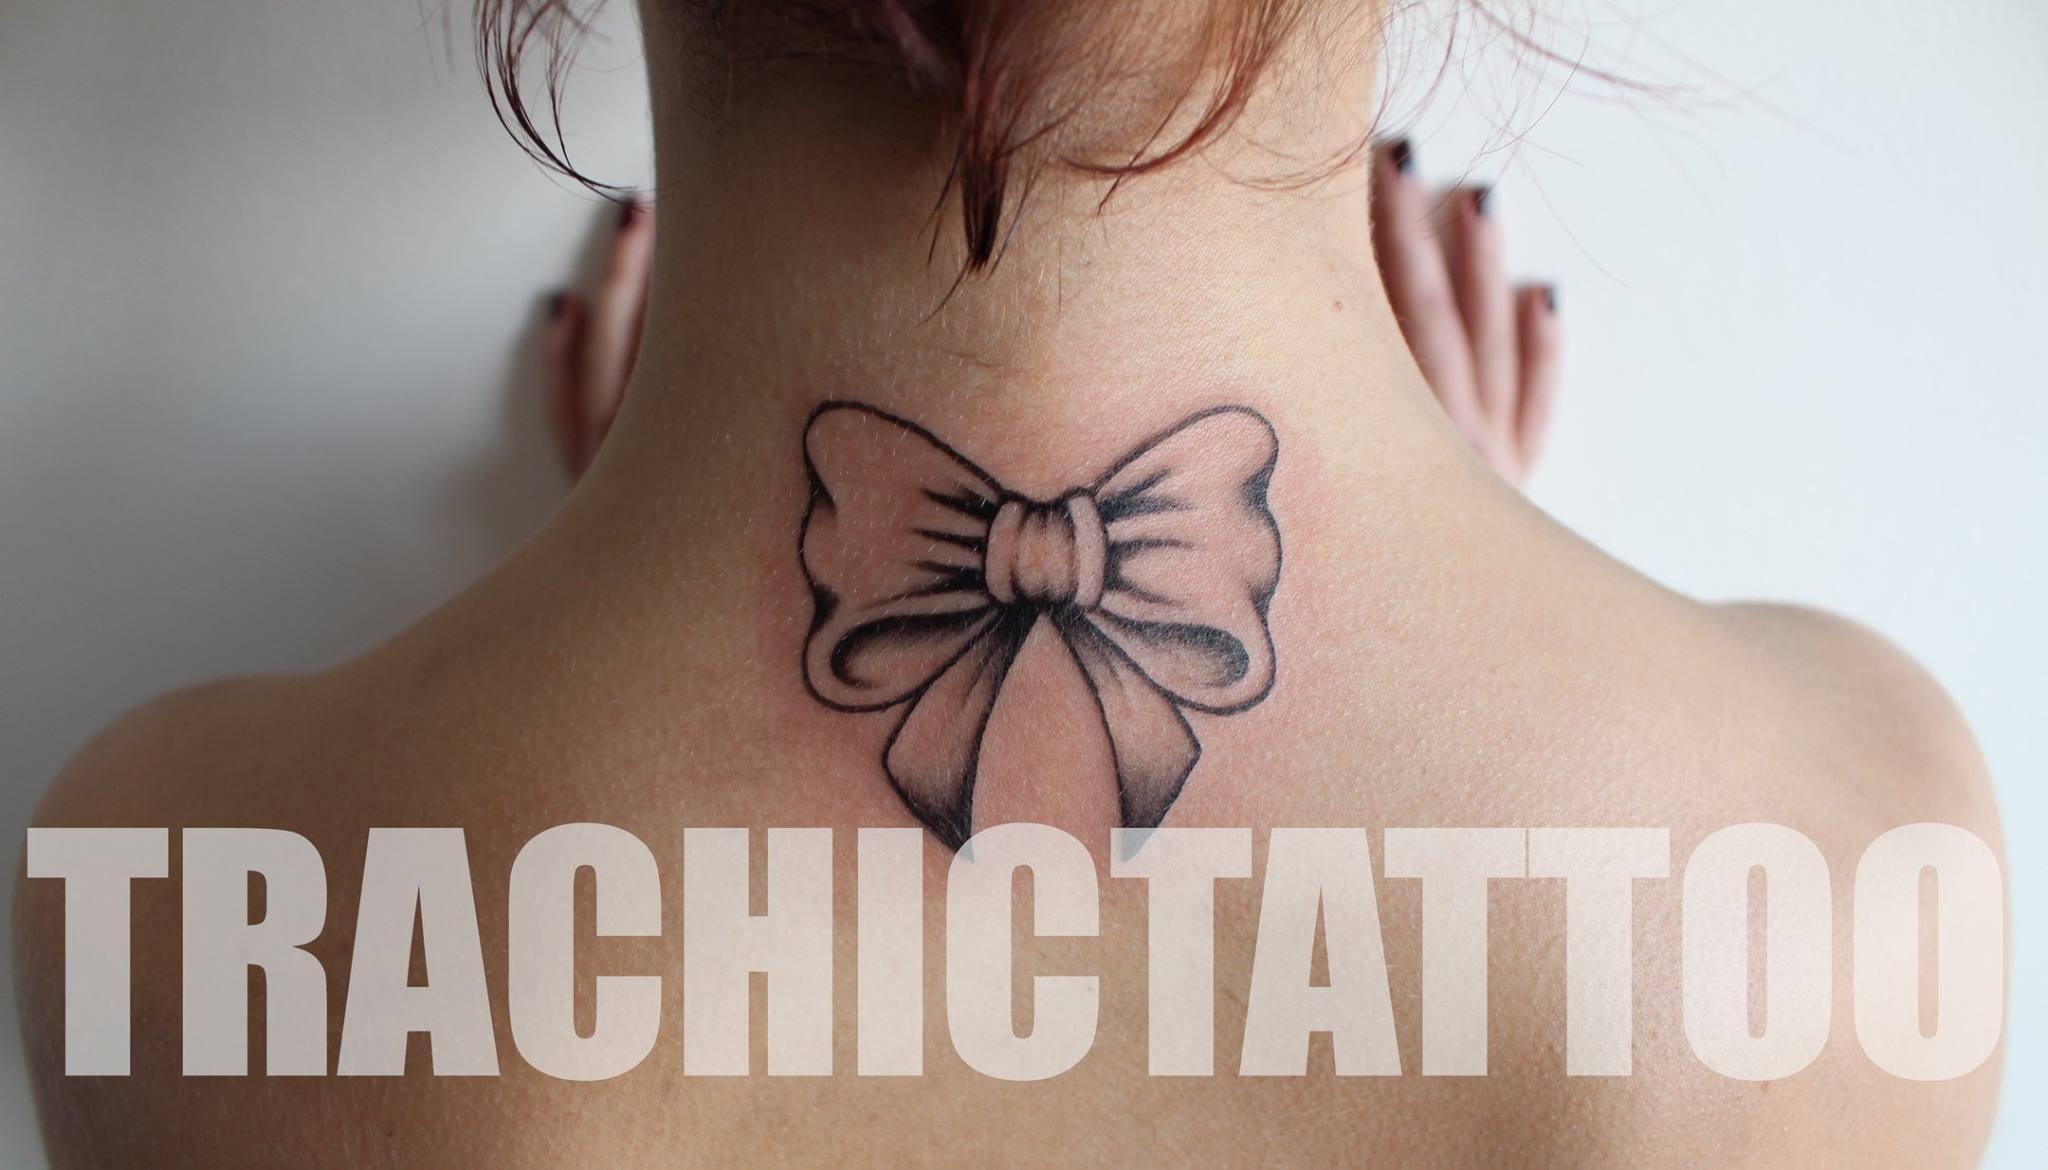 Trachic_Mila07